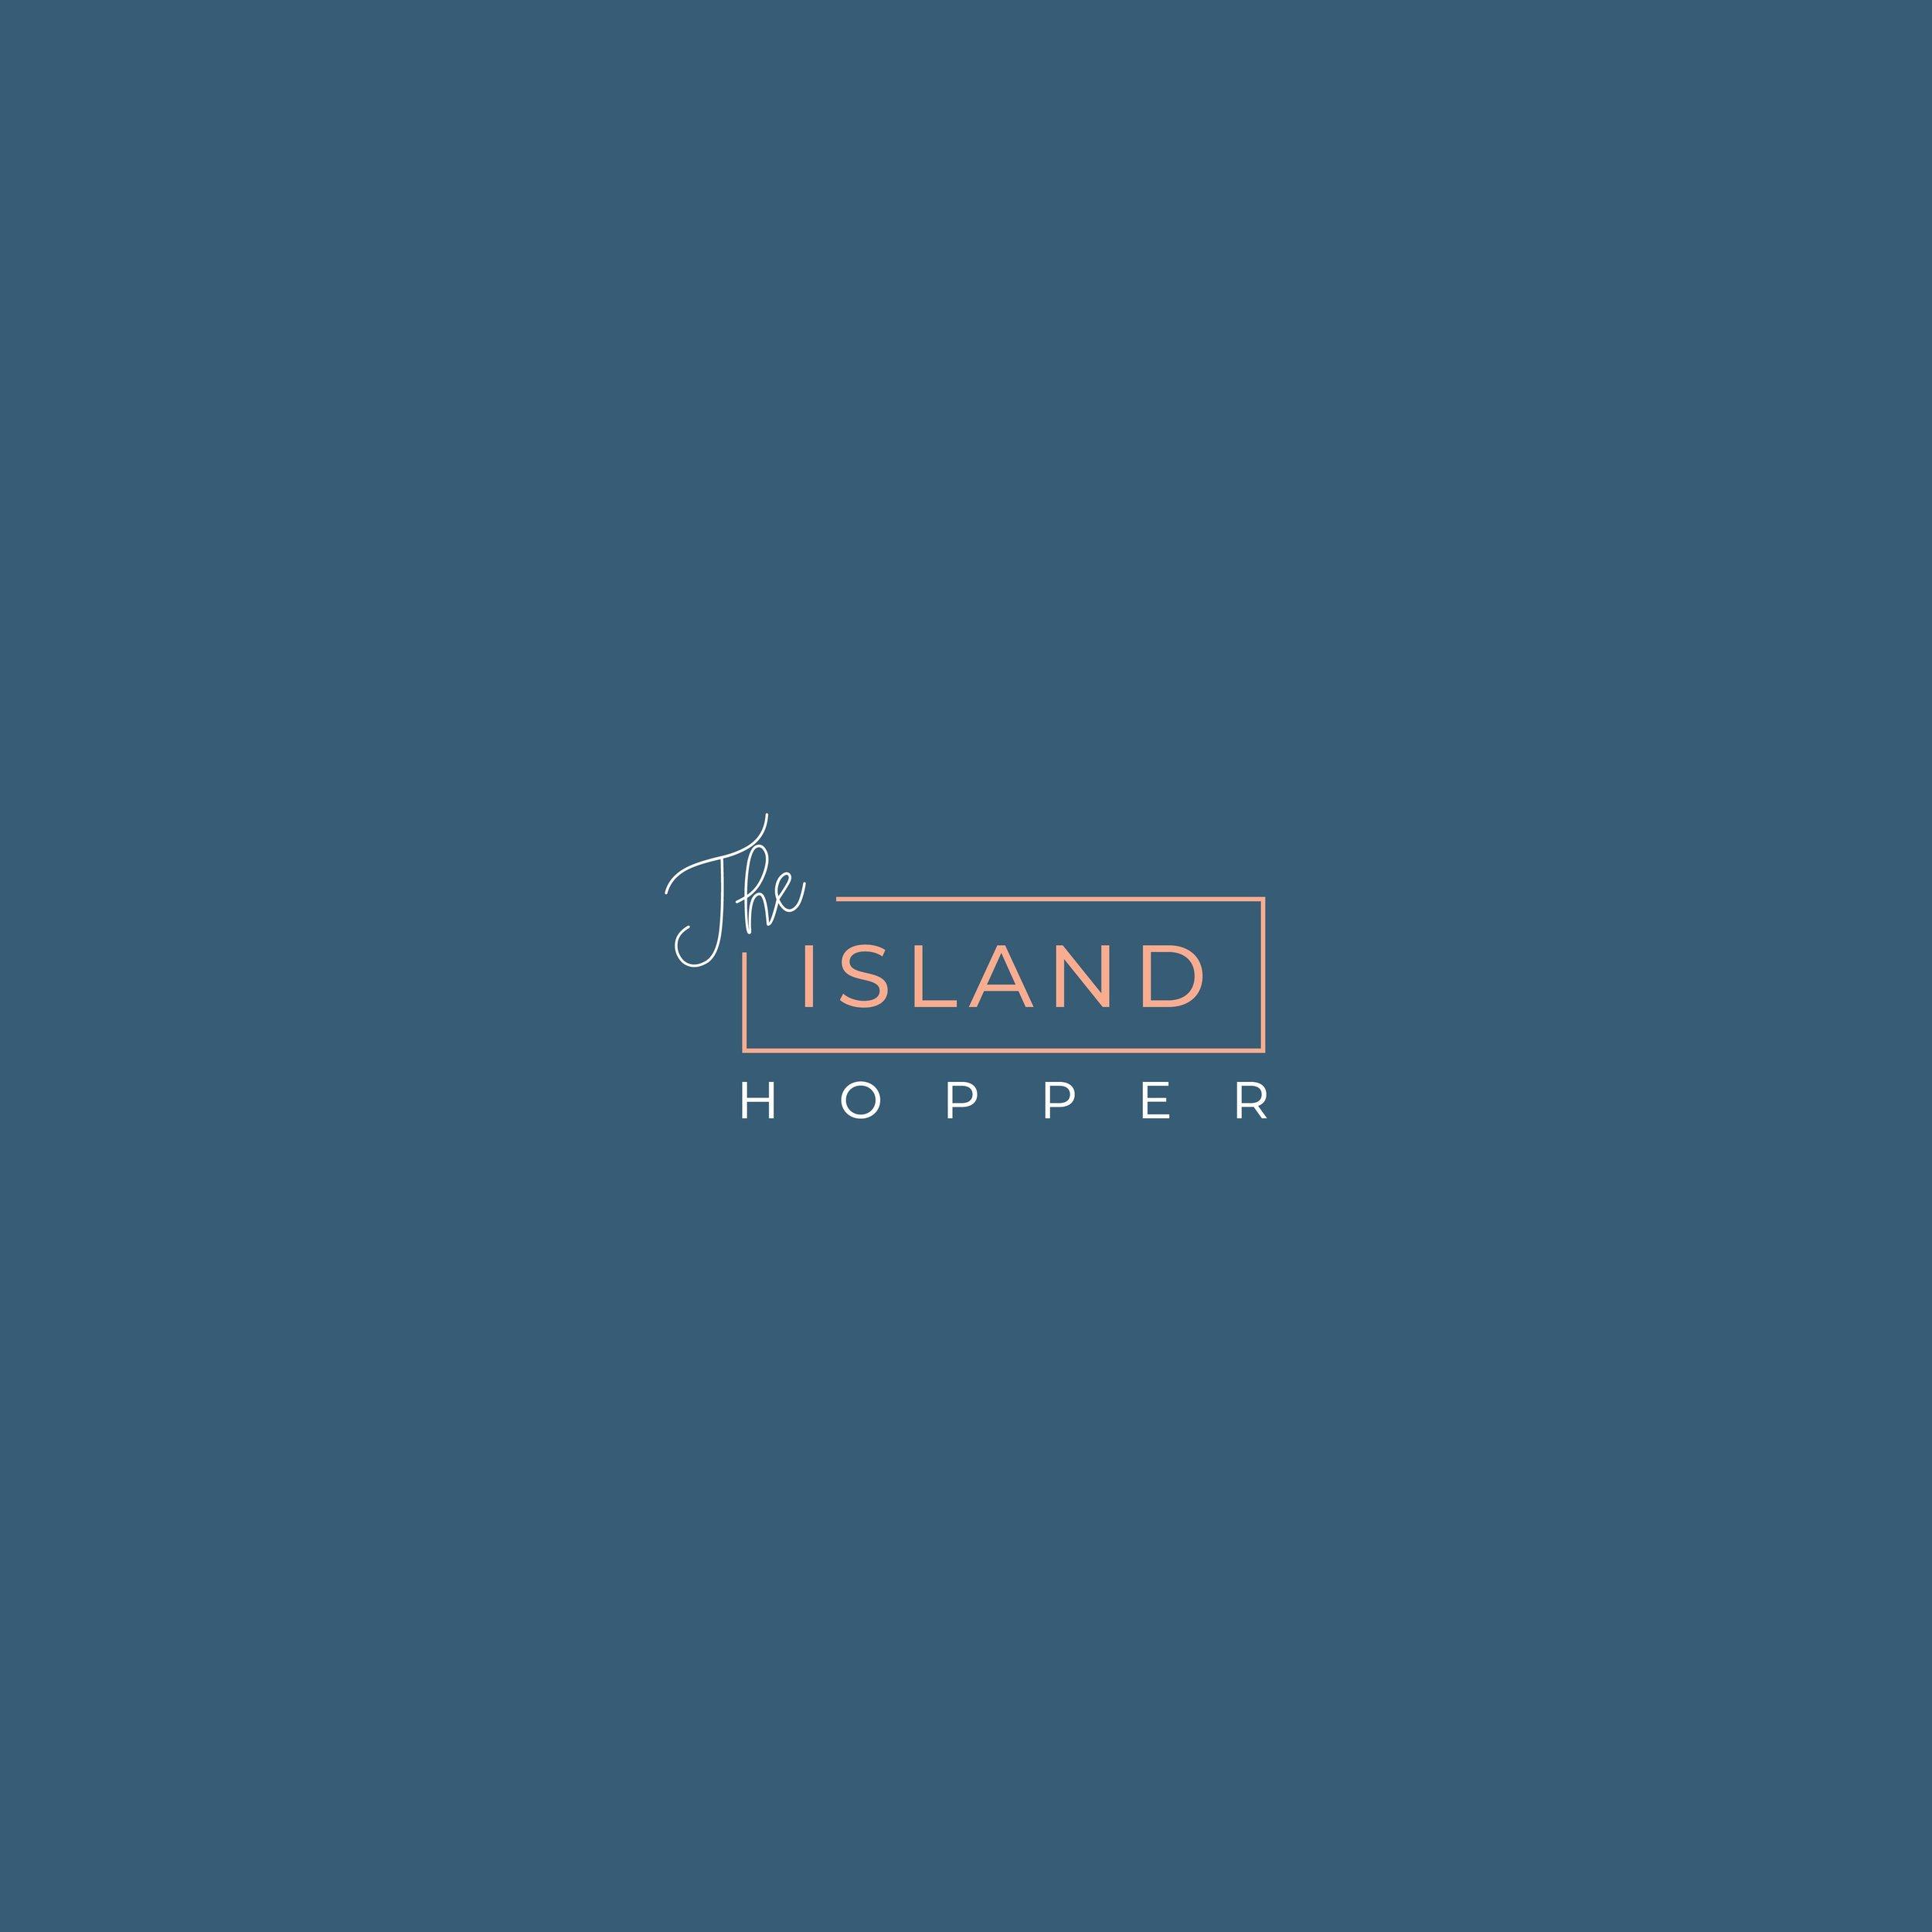 Logo-island-hopper-01.jpg